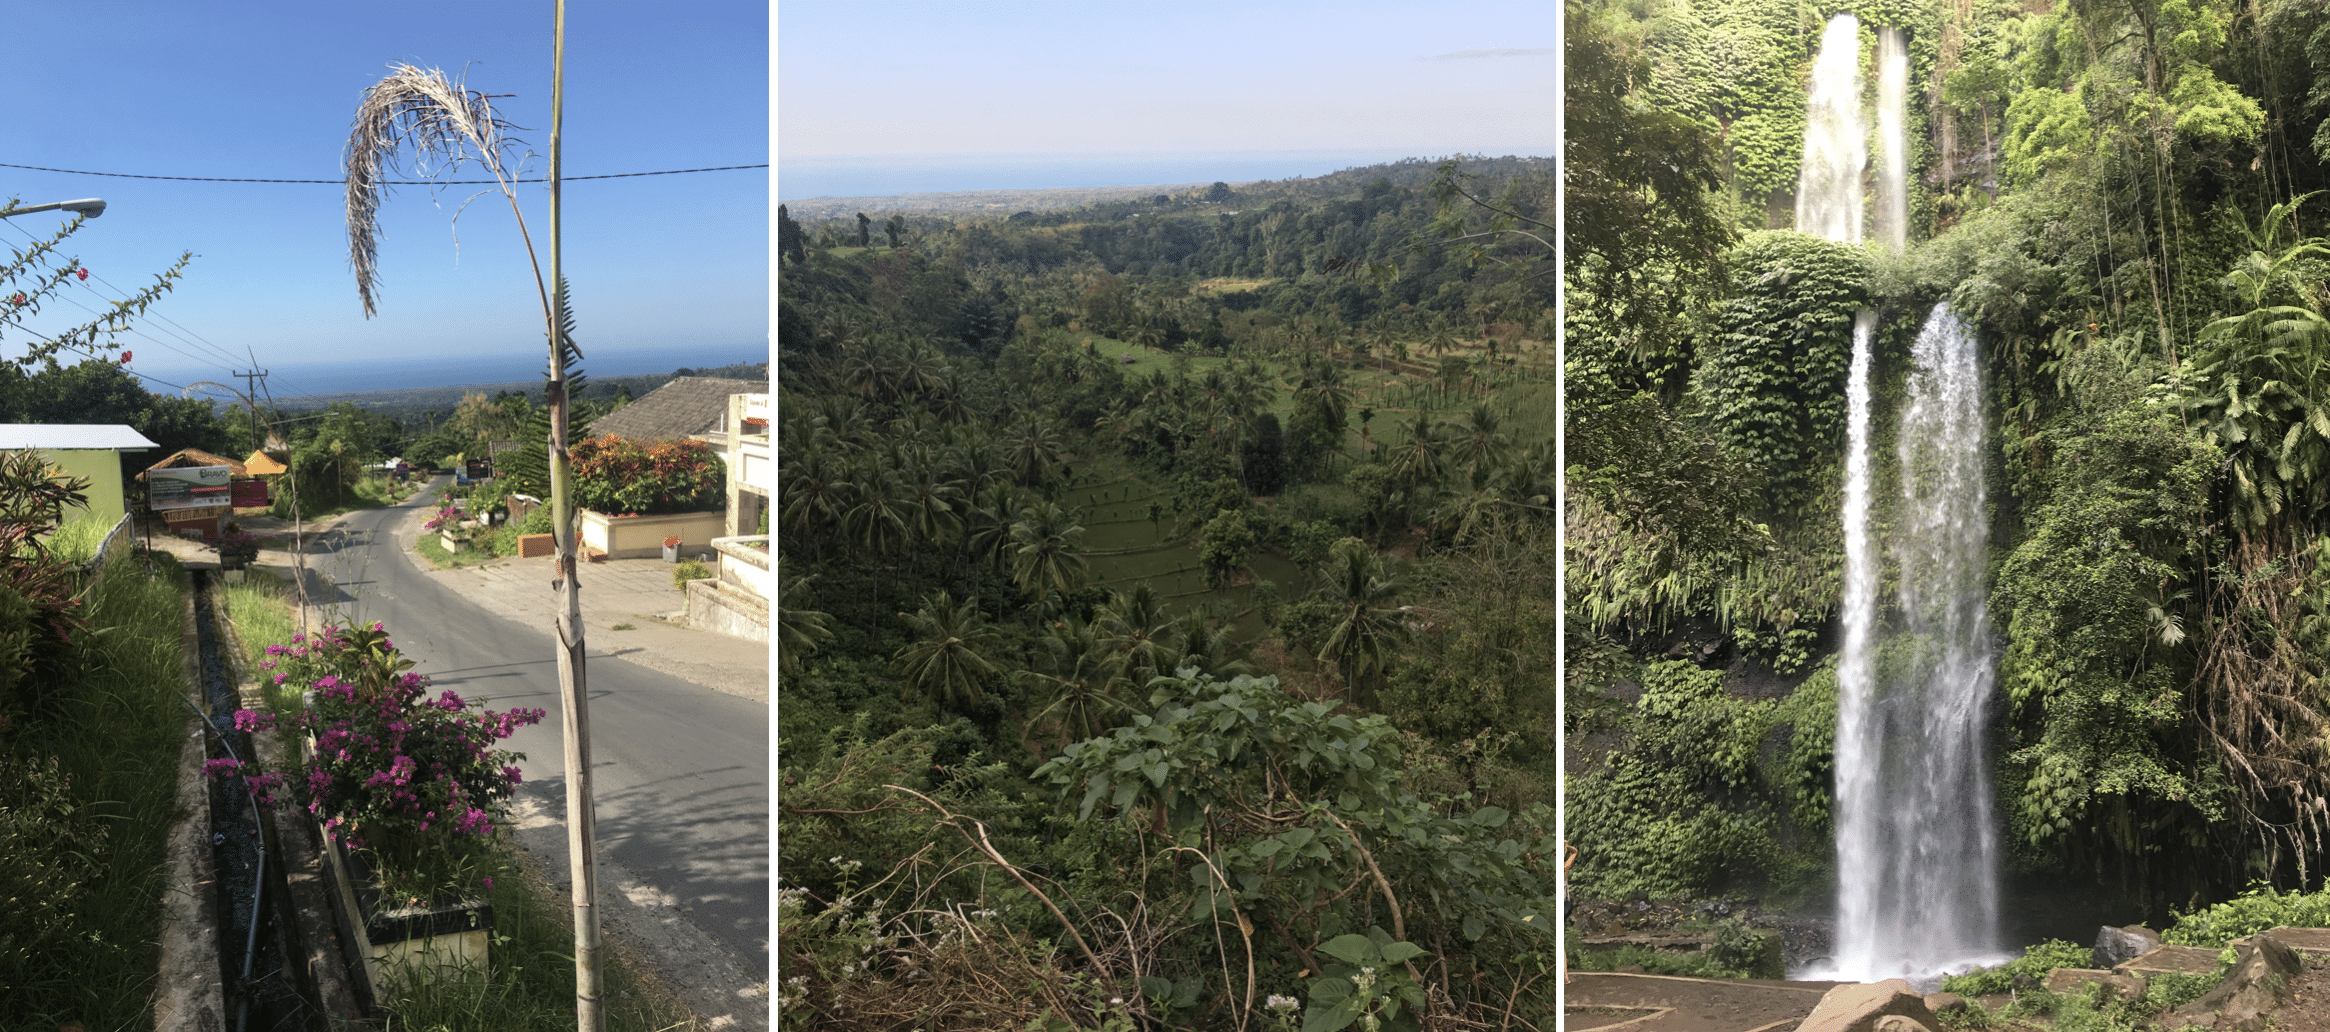 vues du village de senaru a lombok